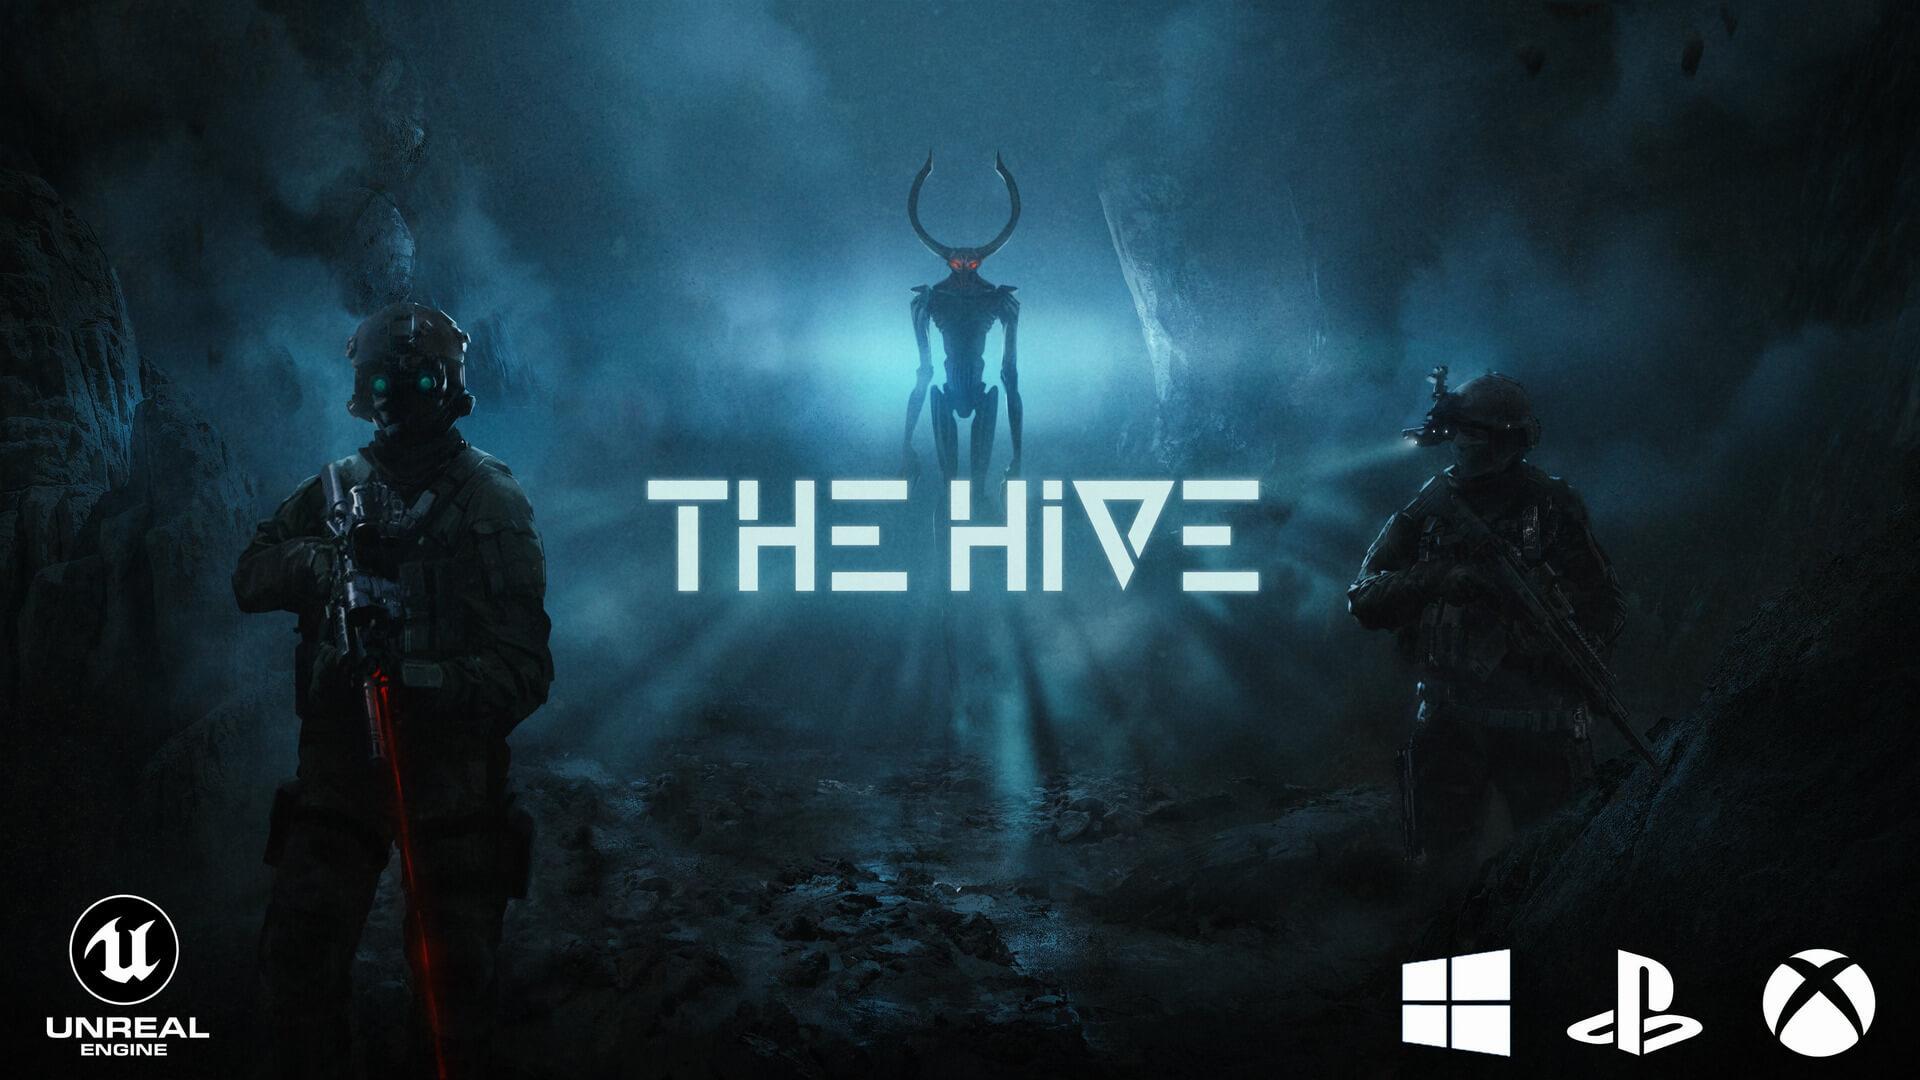 На Kickstarter появился новый шутер - The Hive